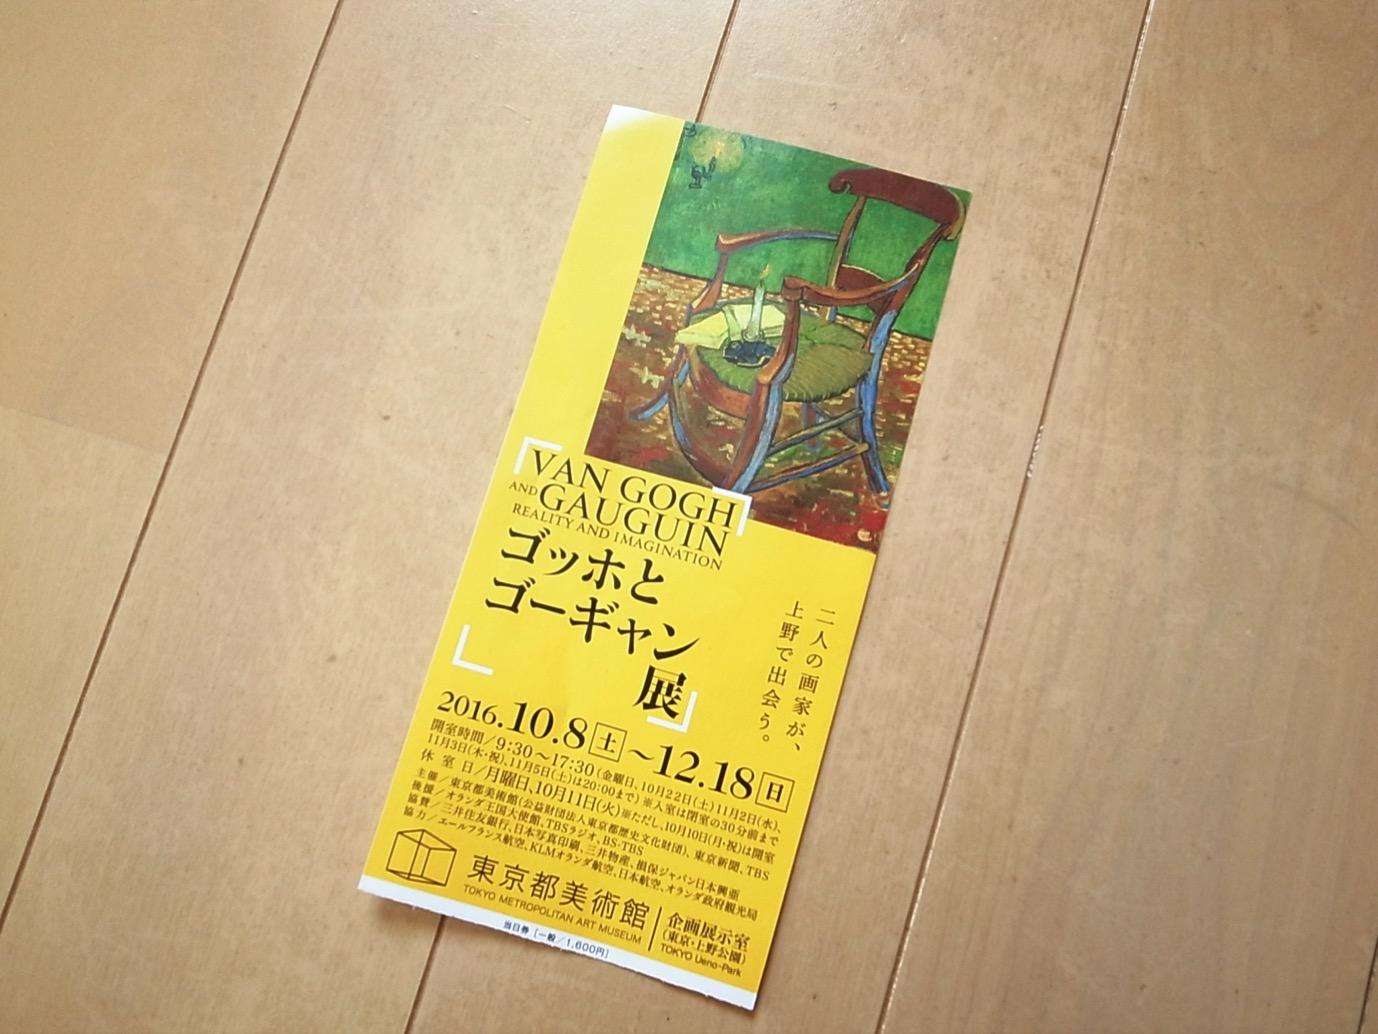 Gogh and gauguin 4